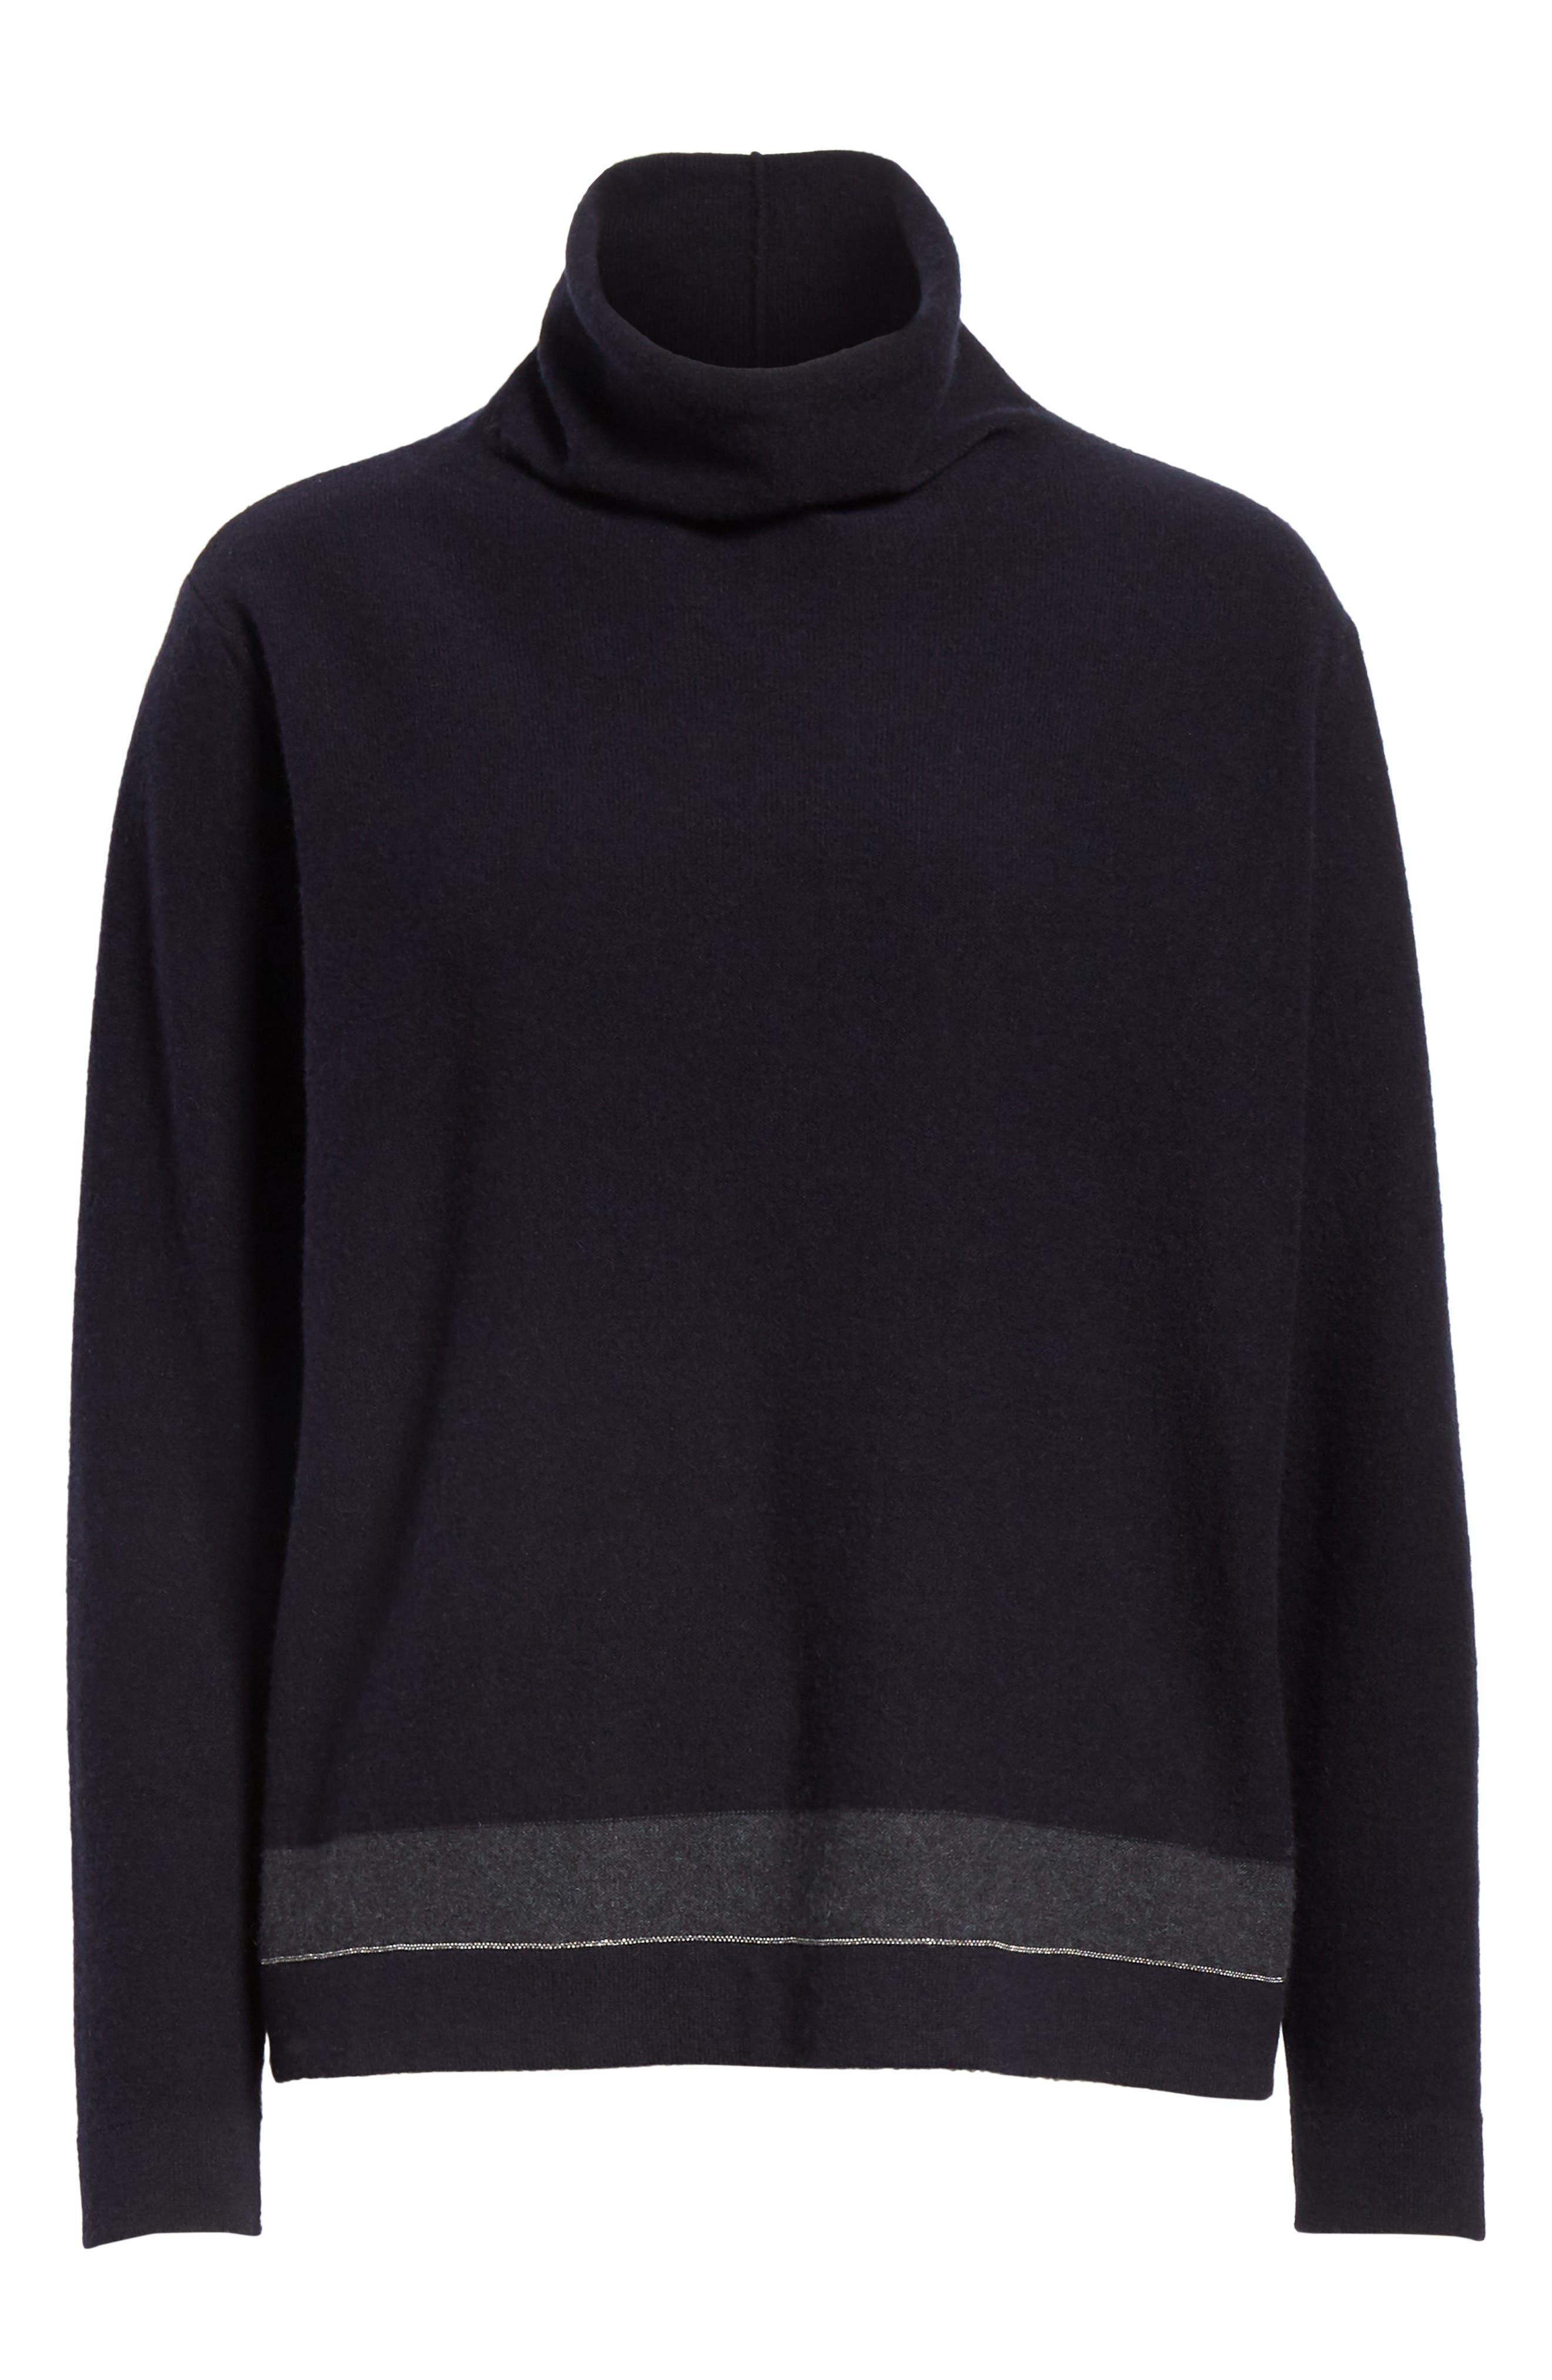 Bead Detail Cashmere Turtleneck Sweater,                             Alternate thumbnail 6, color,                             NIGHT BLUE